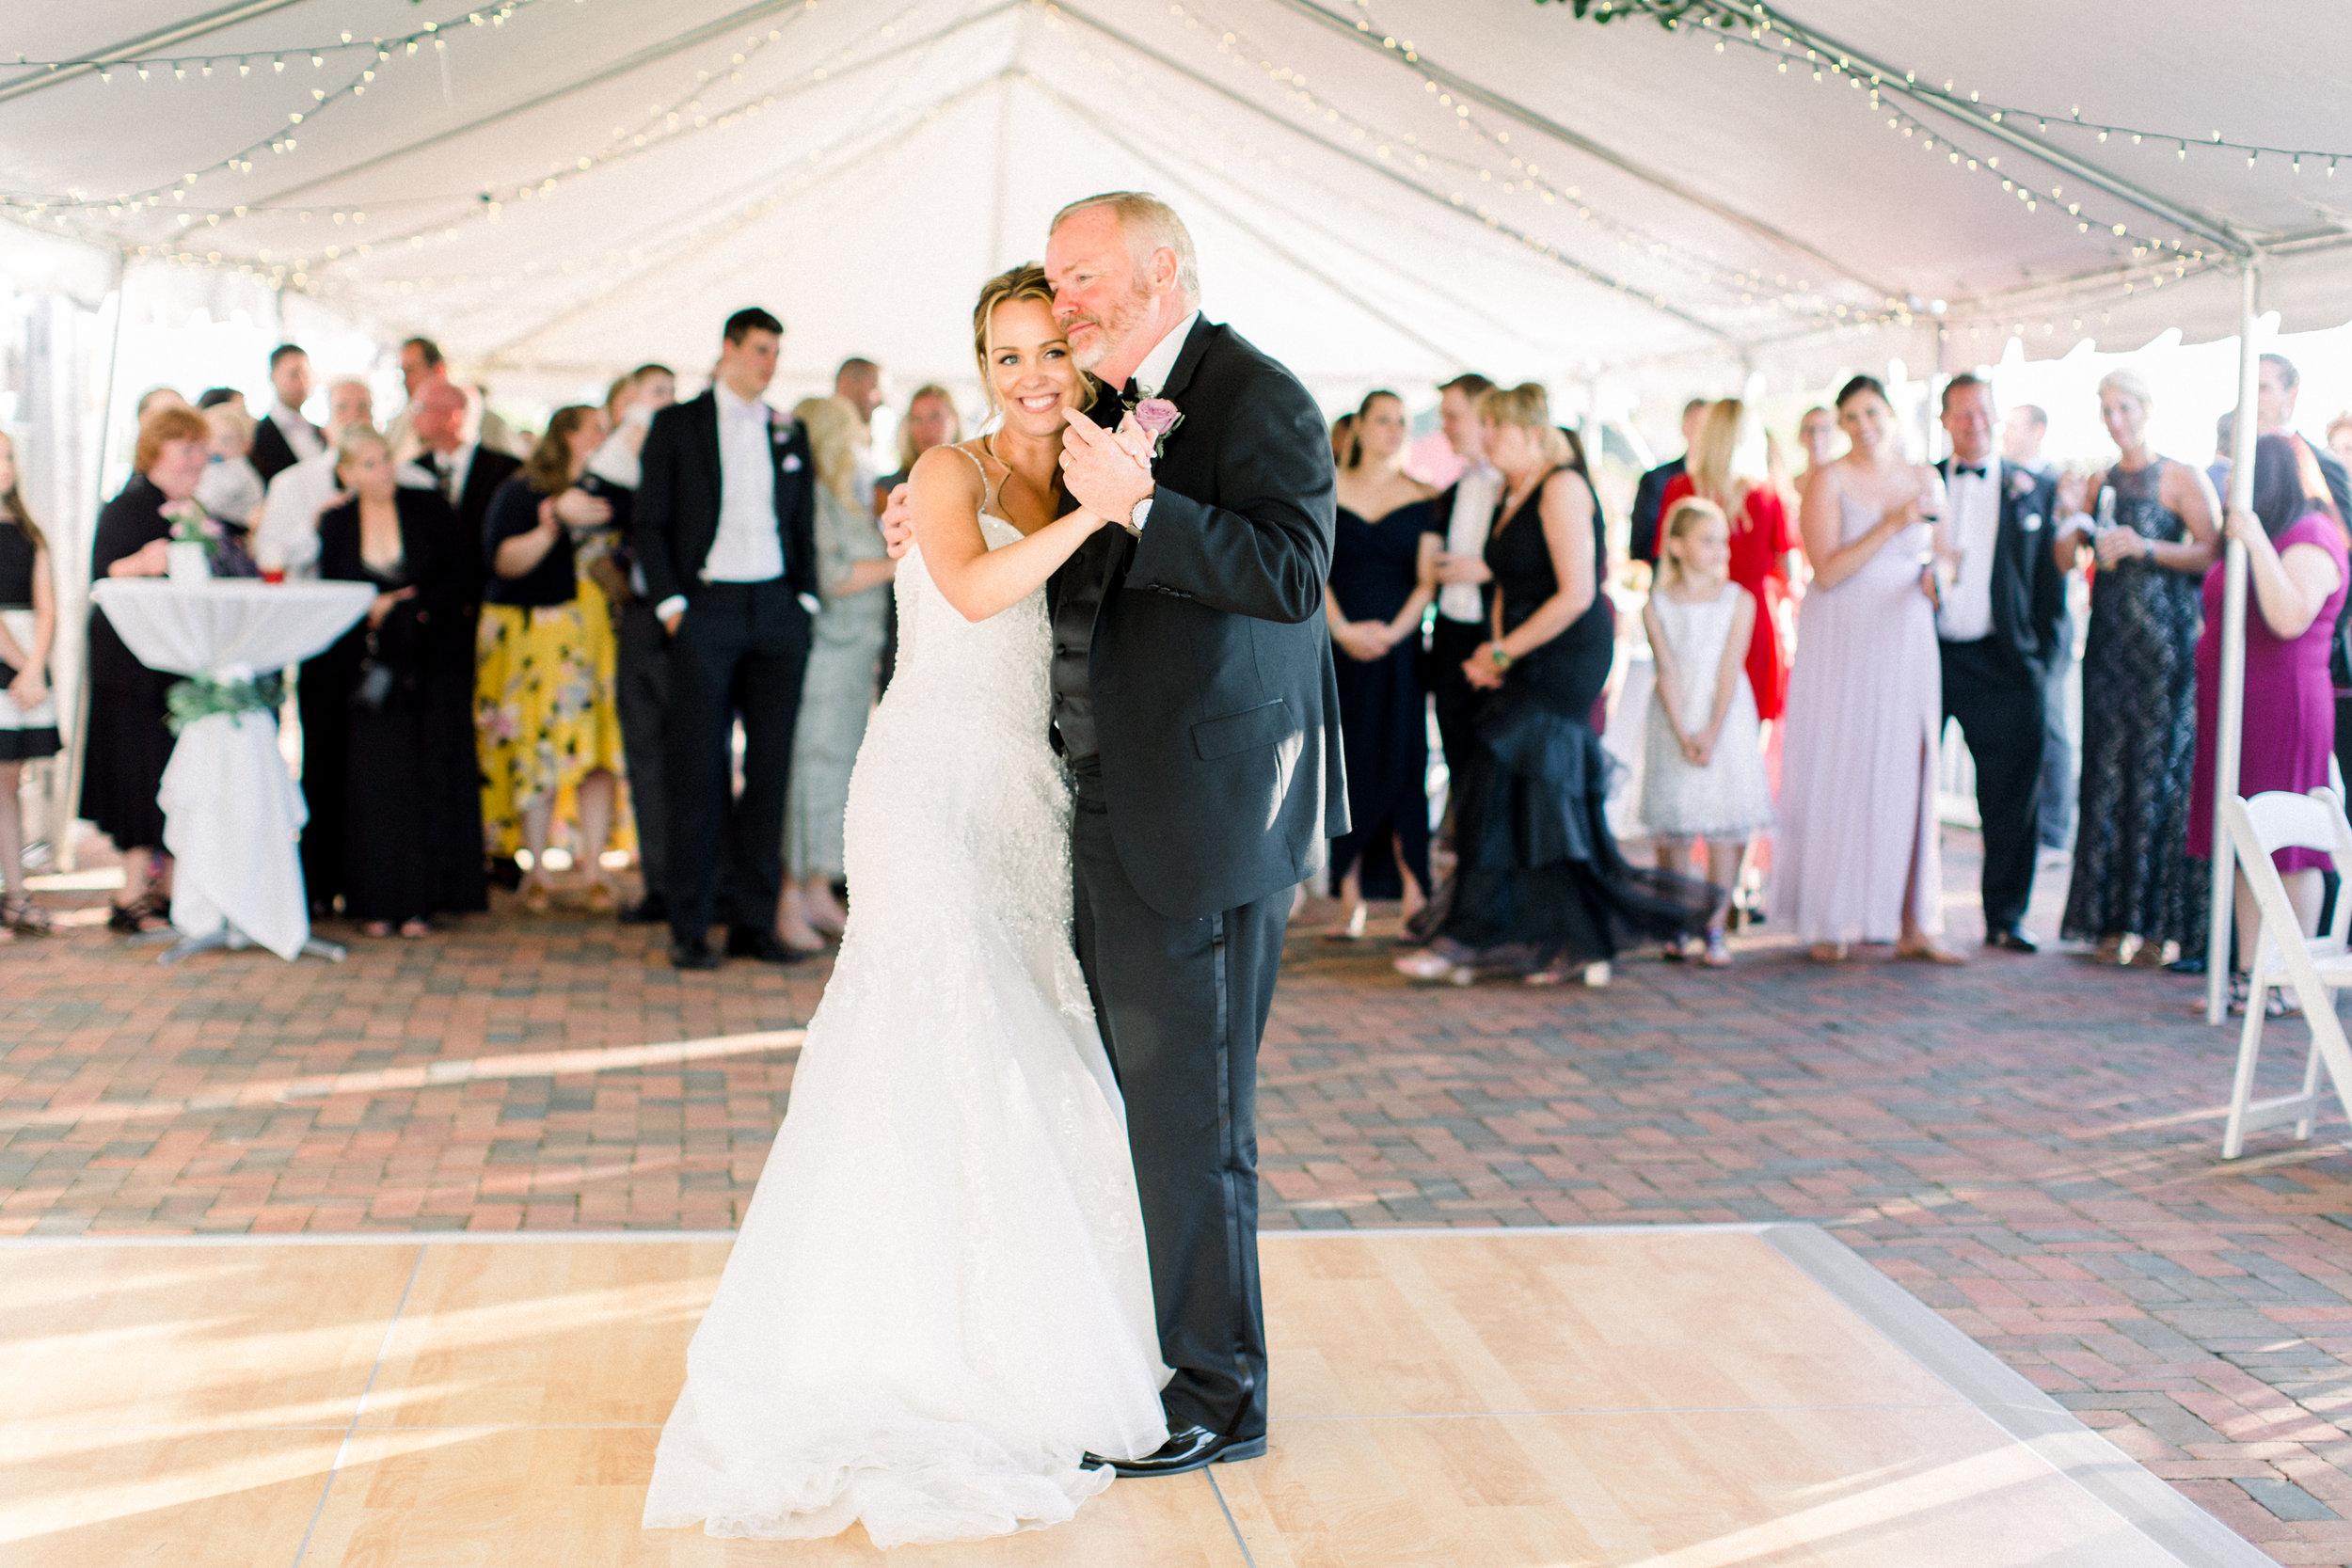 Noss+Wedding+Reception+ Dances-89.jpg